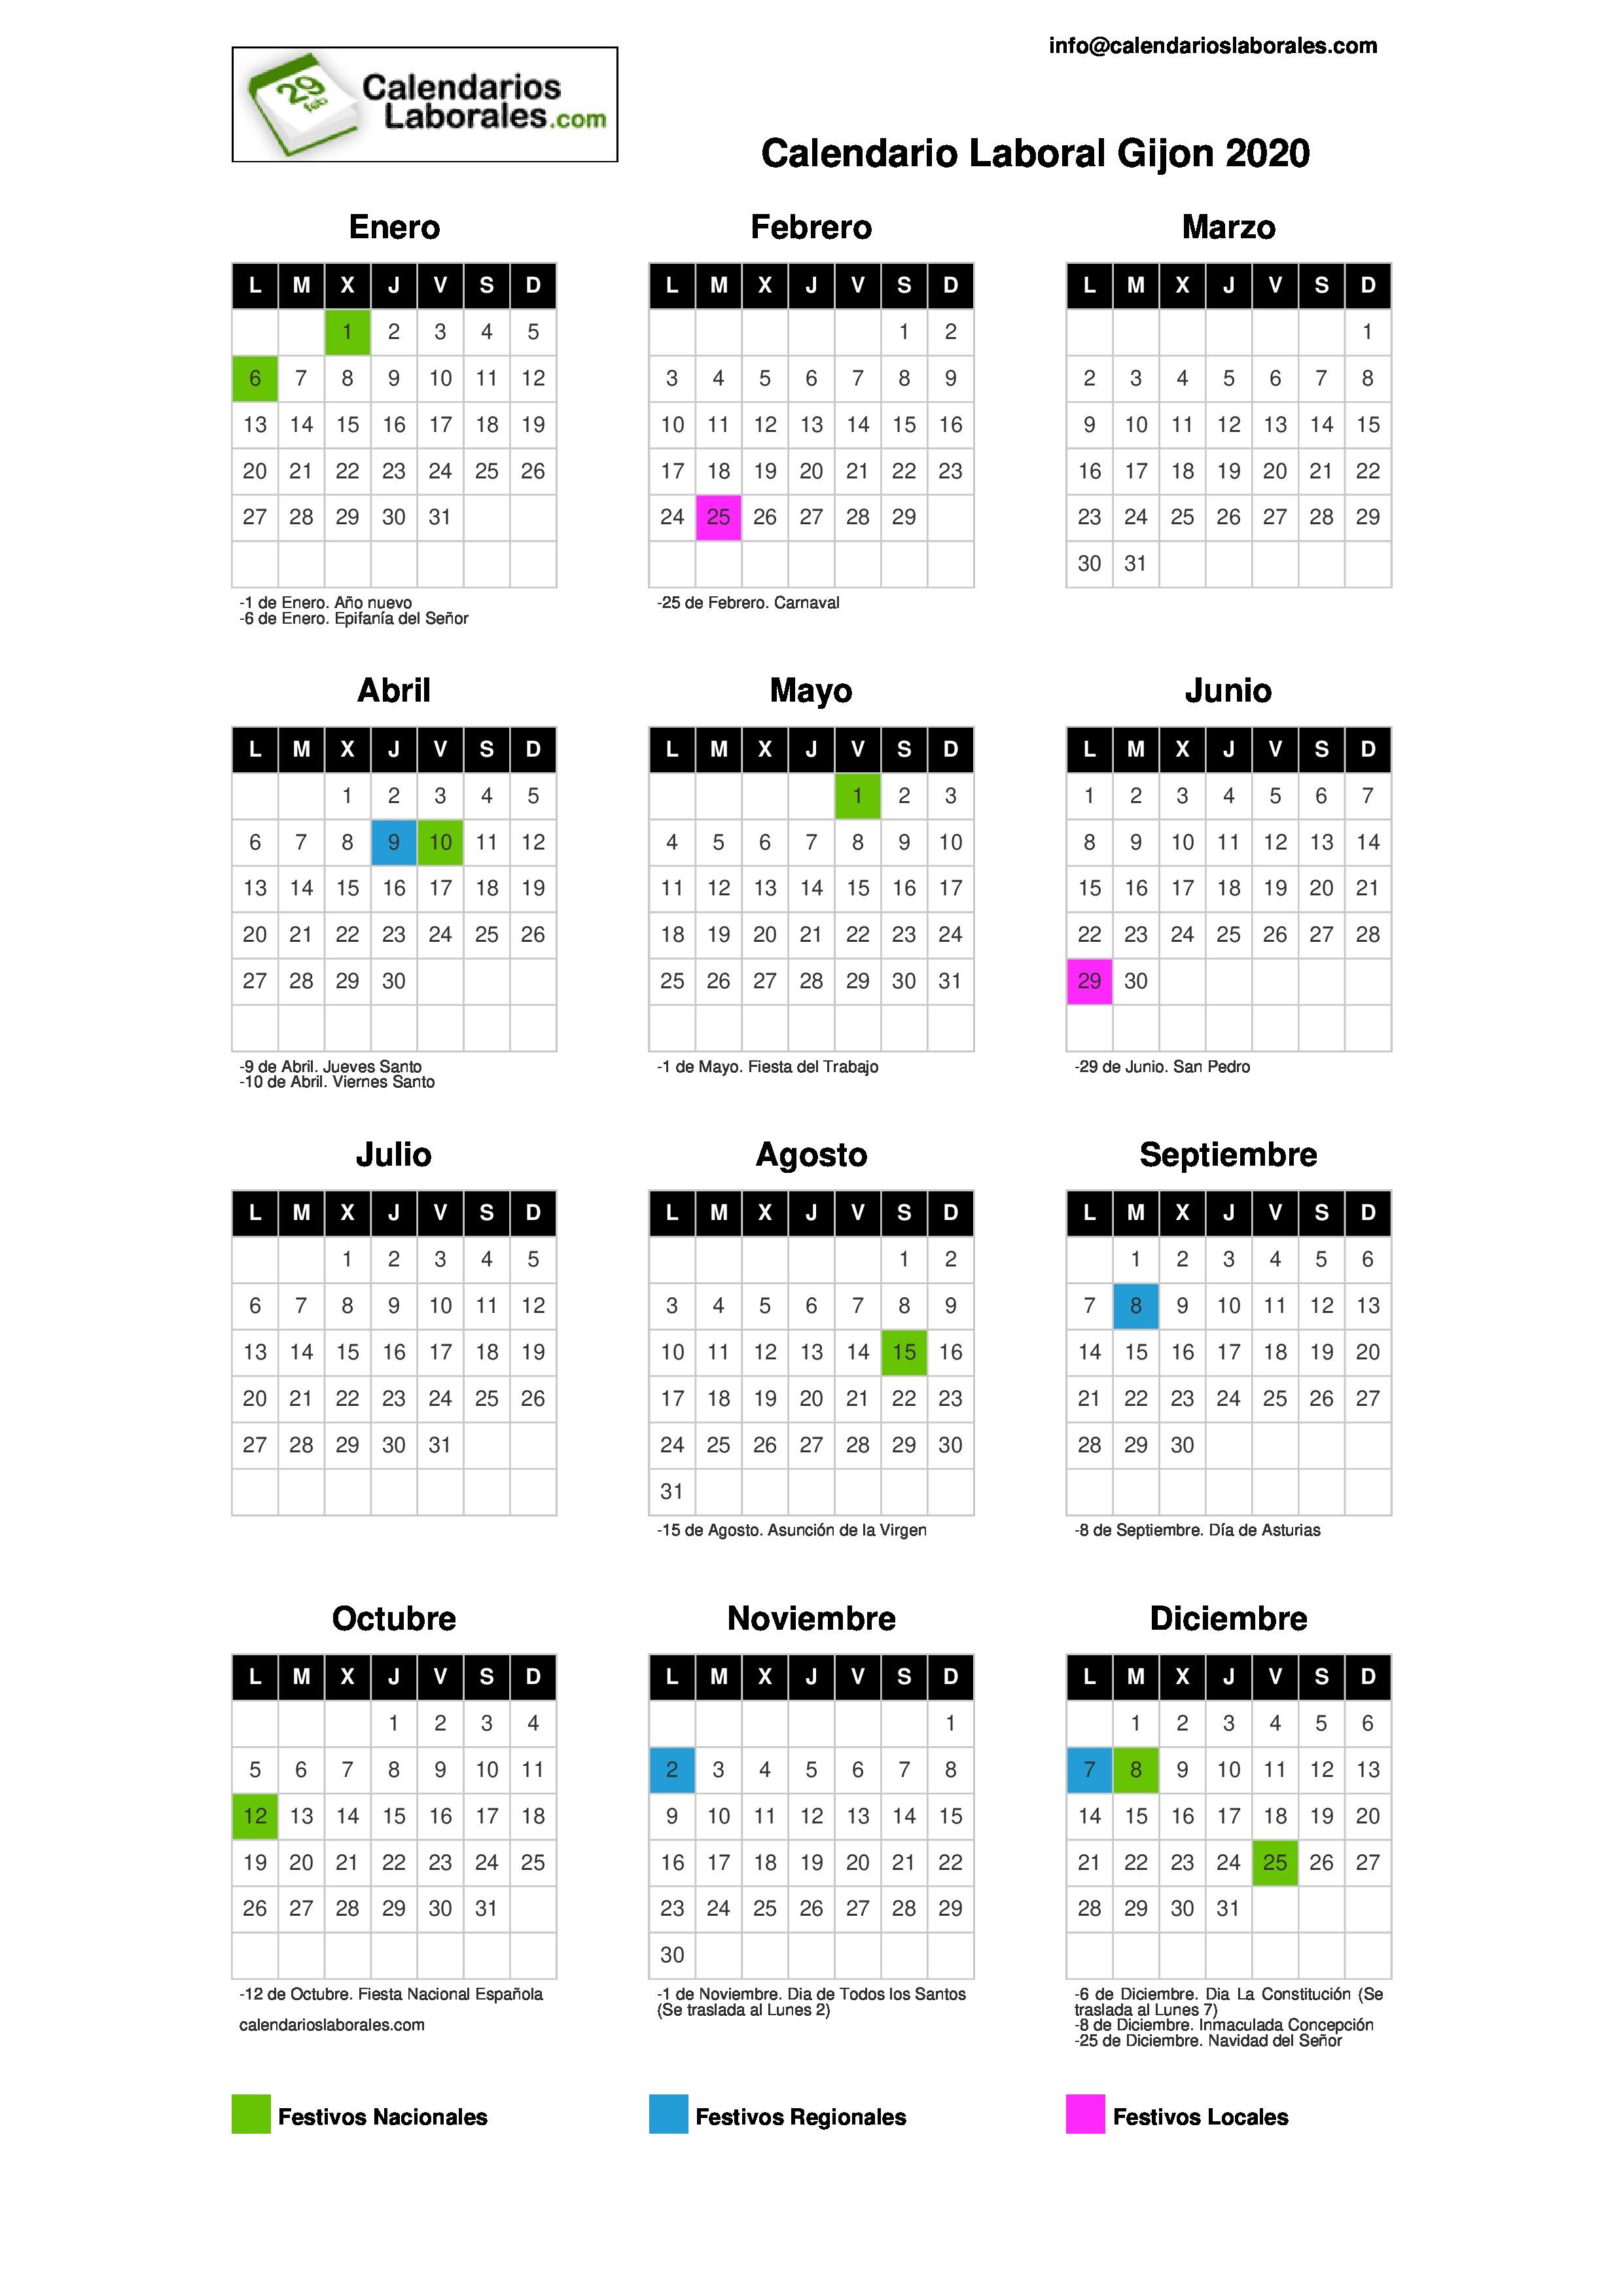 Calendario Laboral 2020 Gijon.Calendario Laboral Gijon 2020